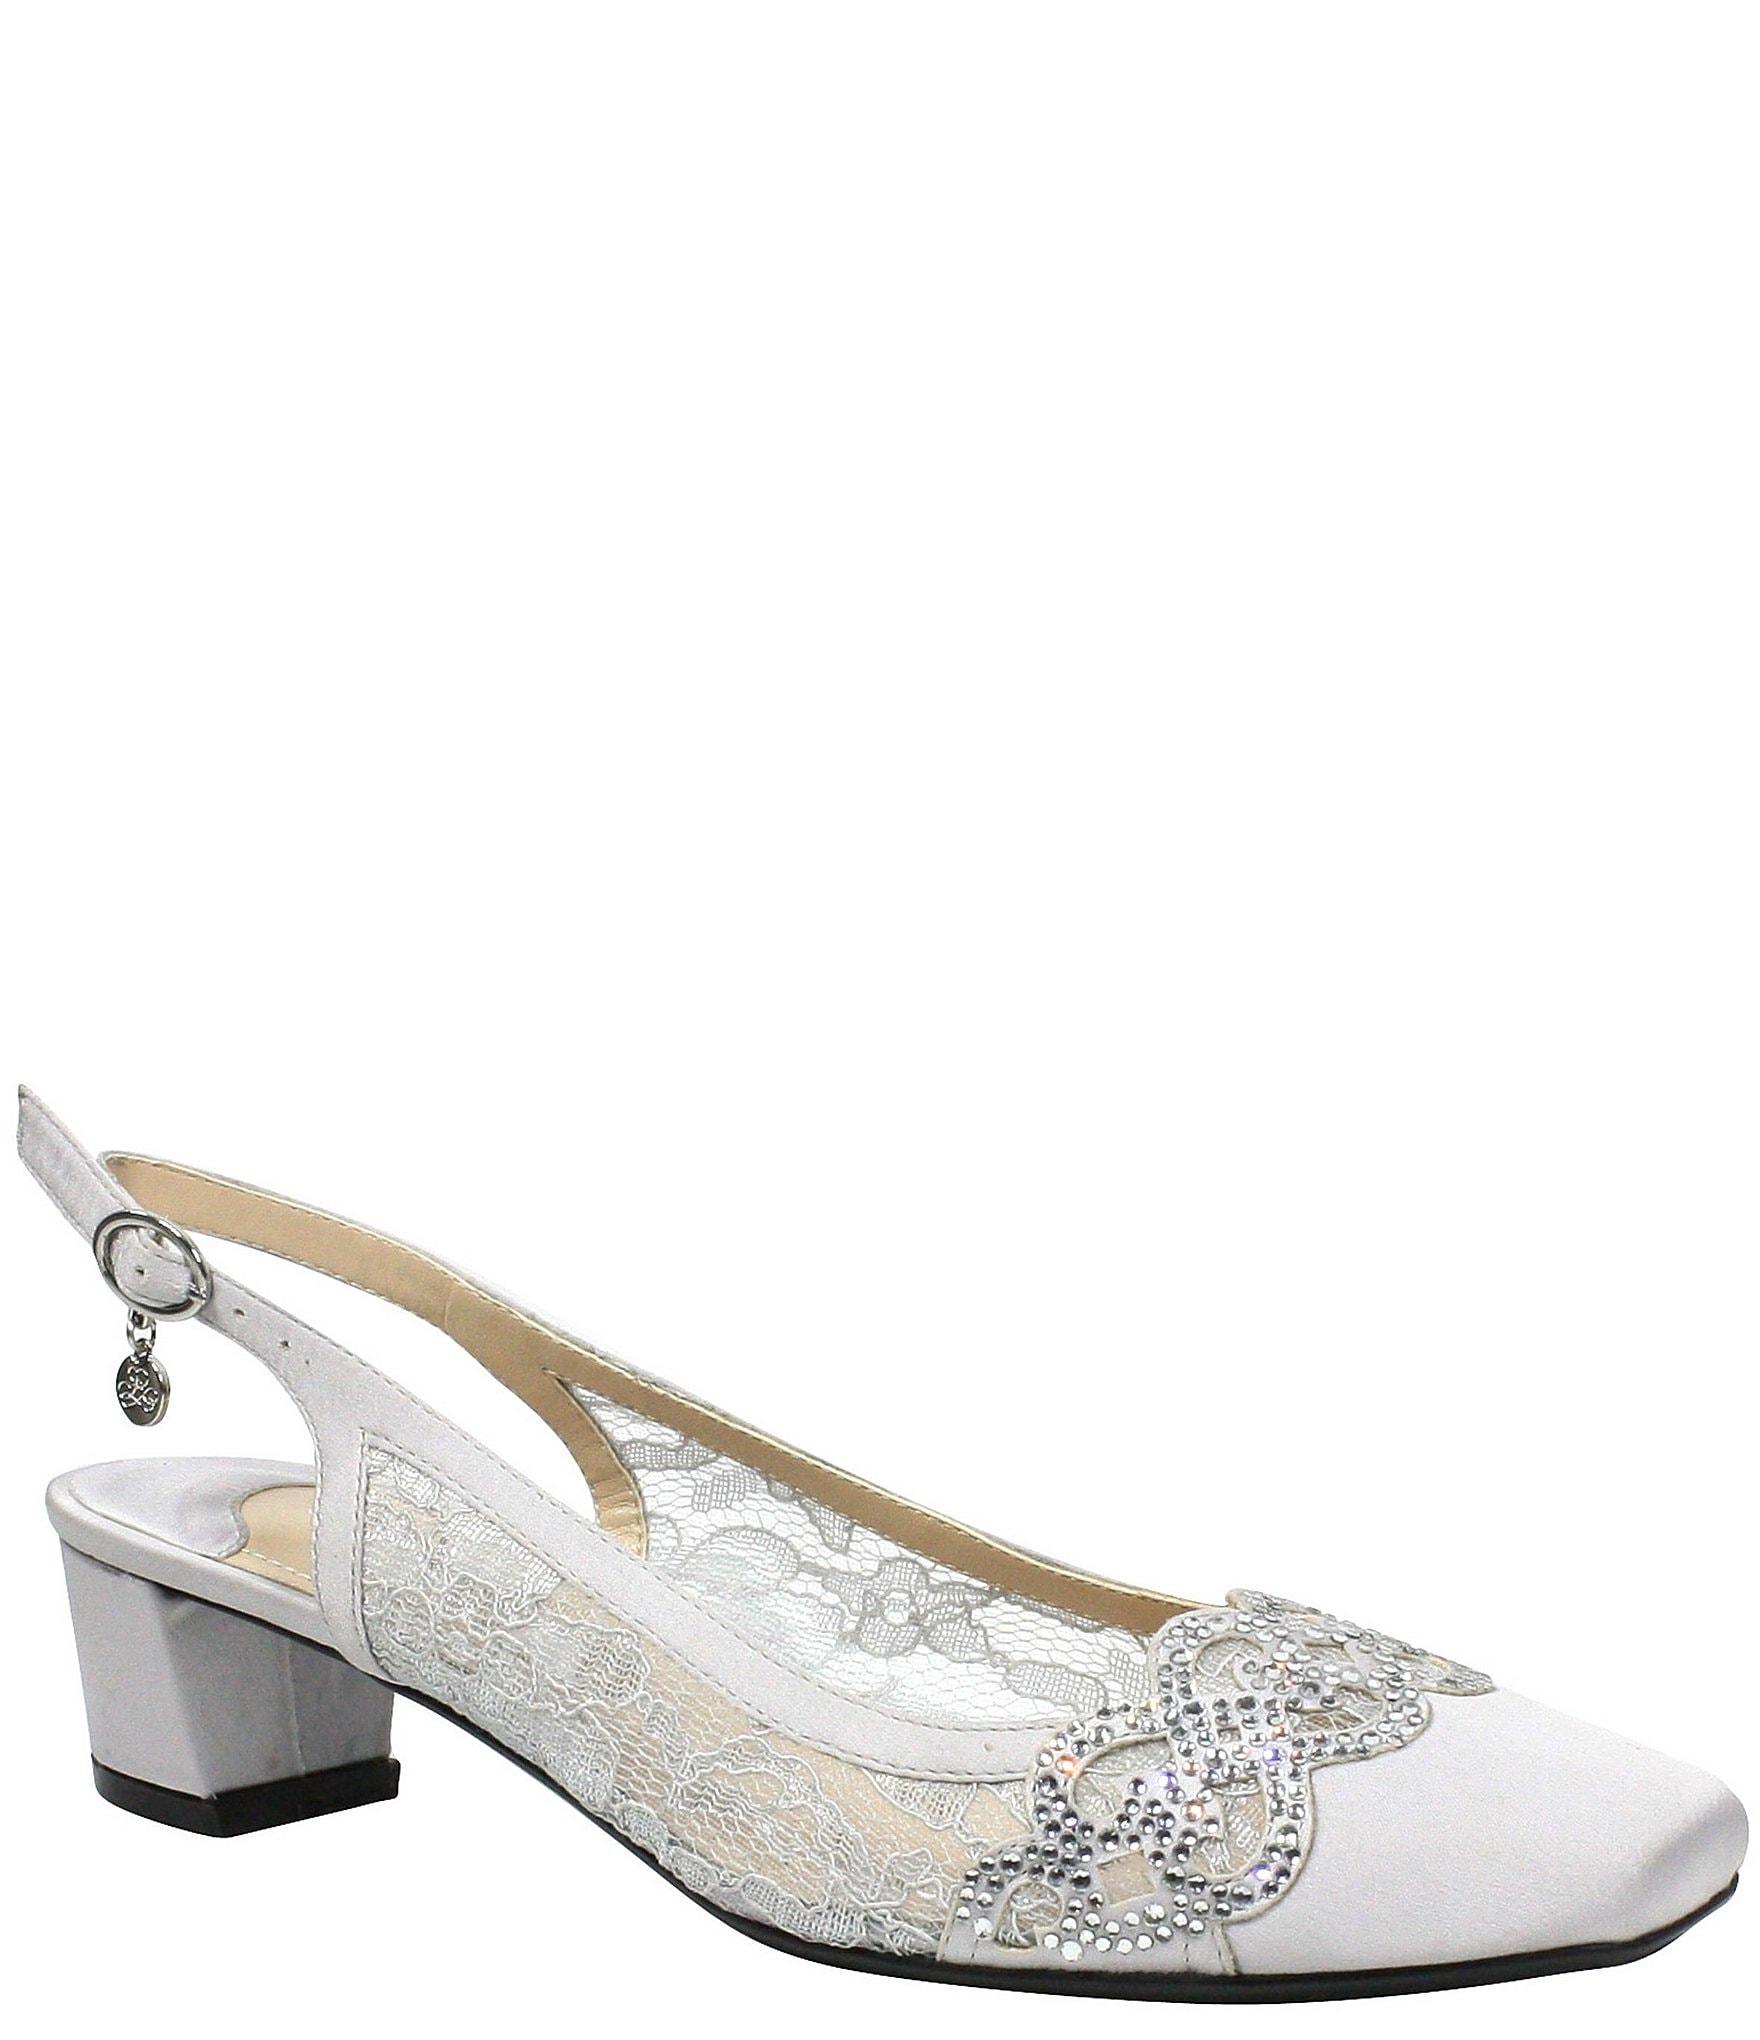 Womens Round Toe Mary Jane Heel Dress Tassel Metal Ankle Strap Shoes Wedding 13